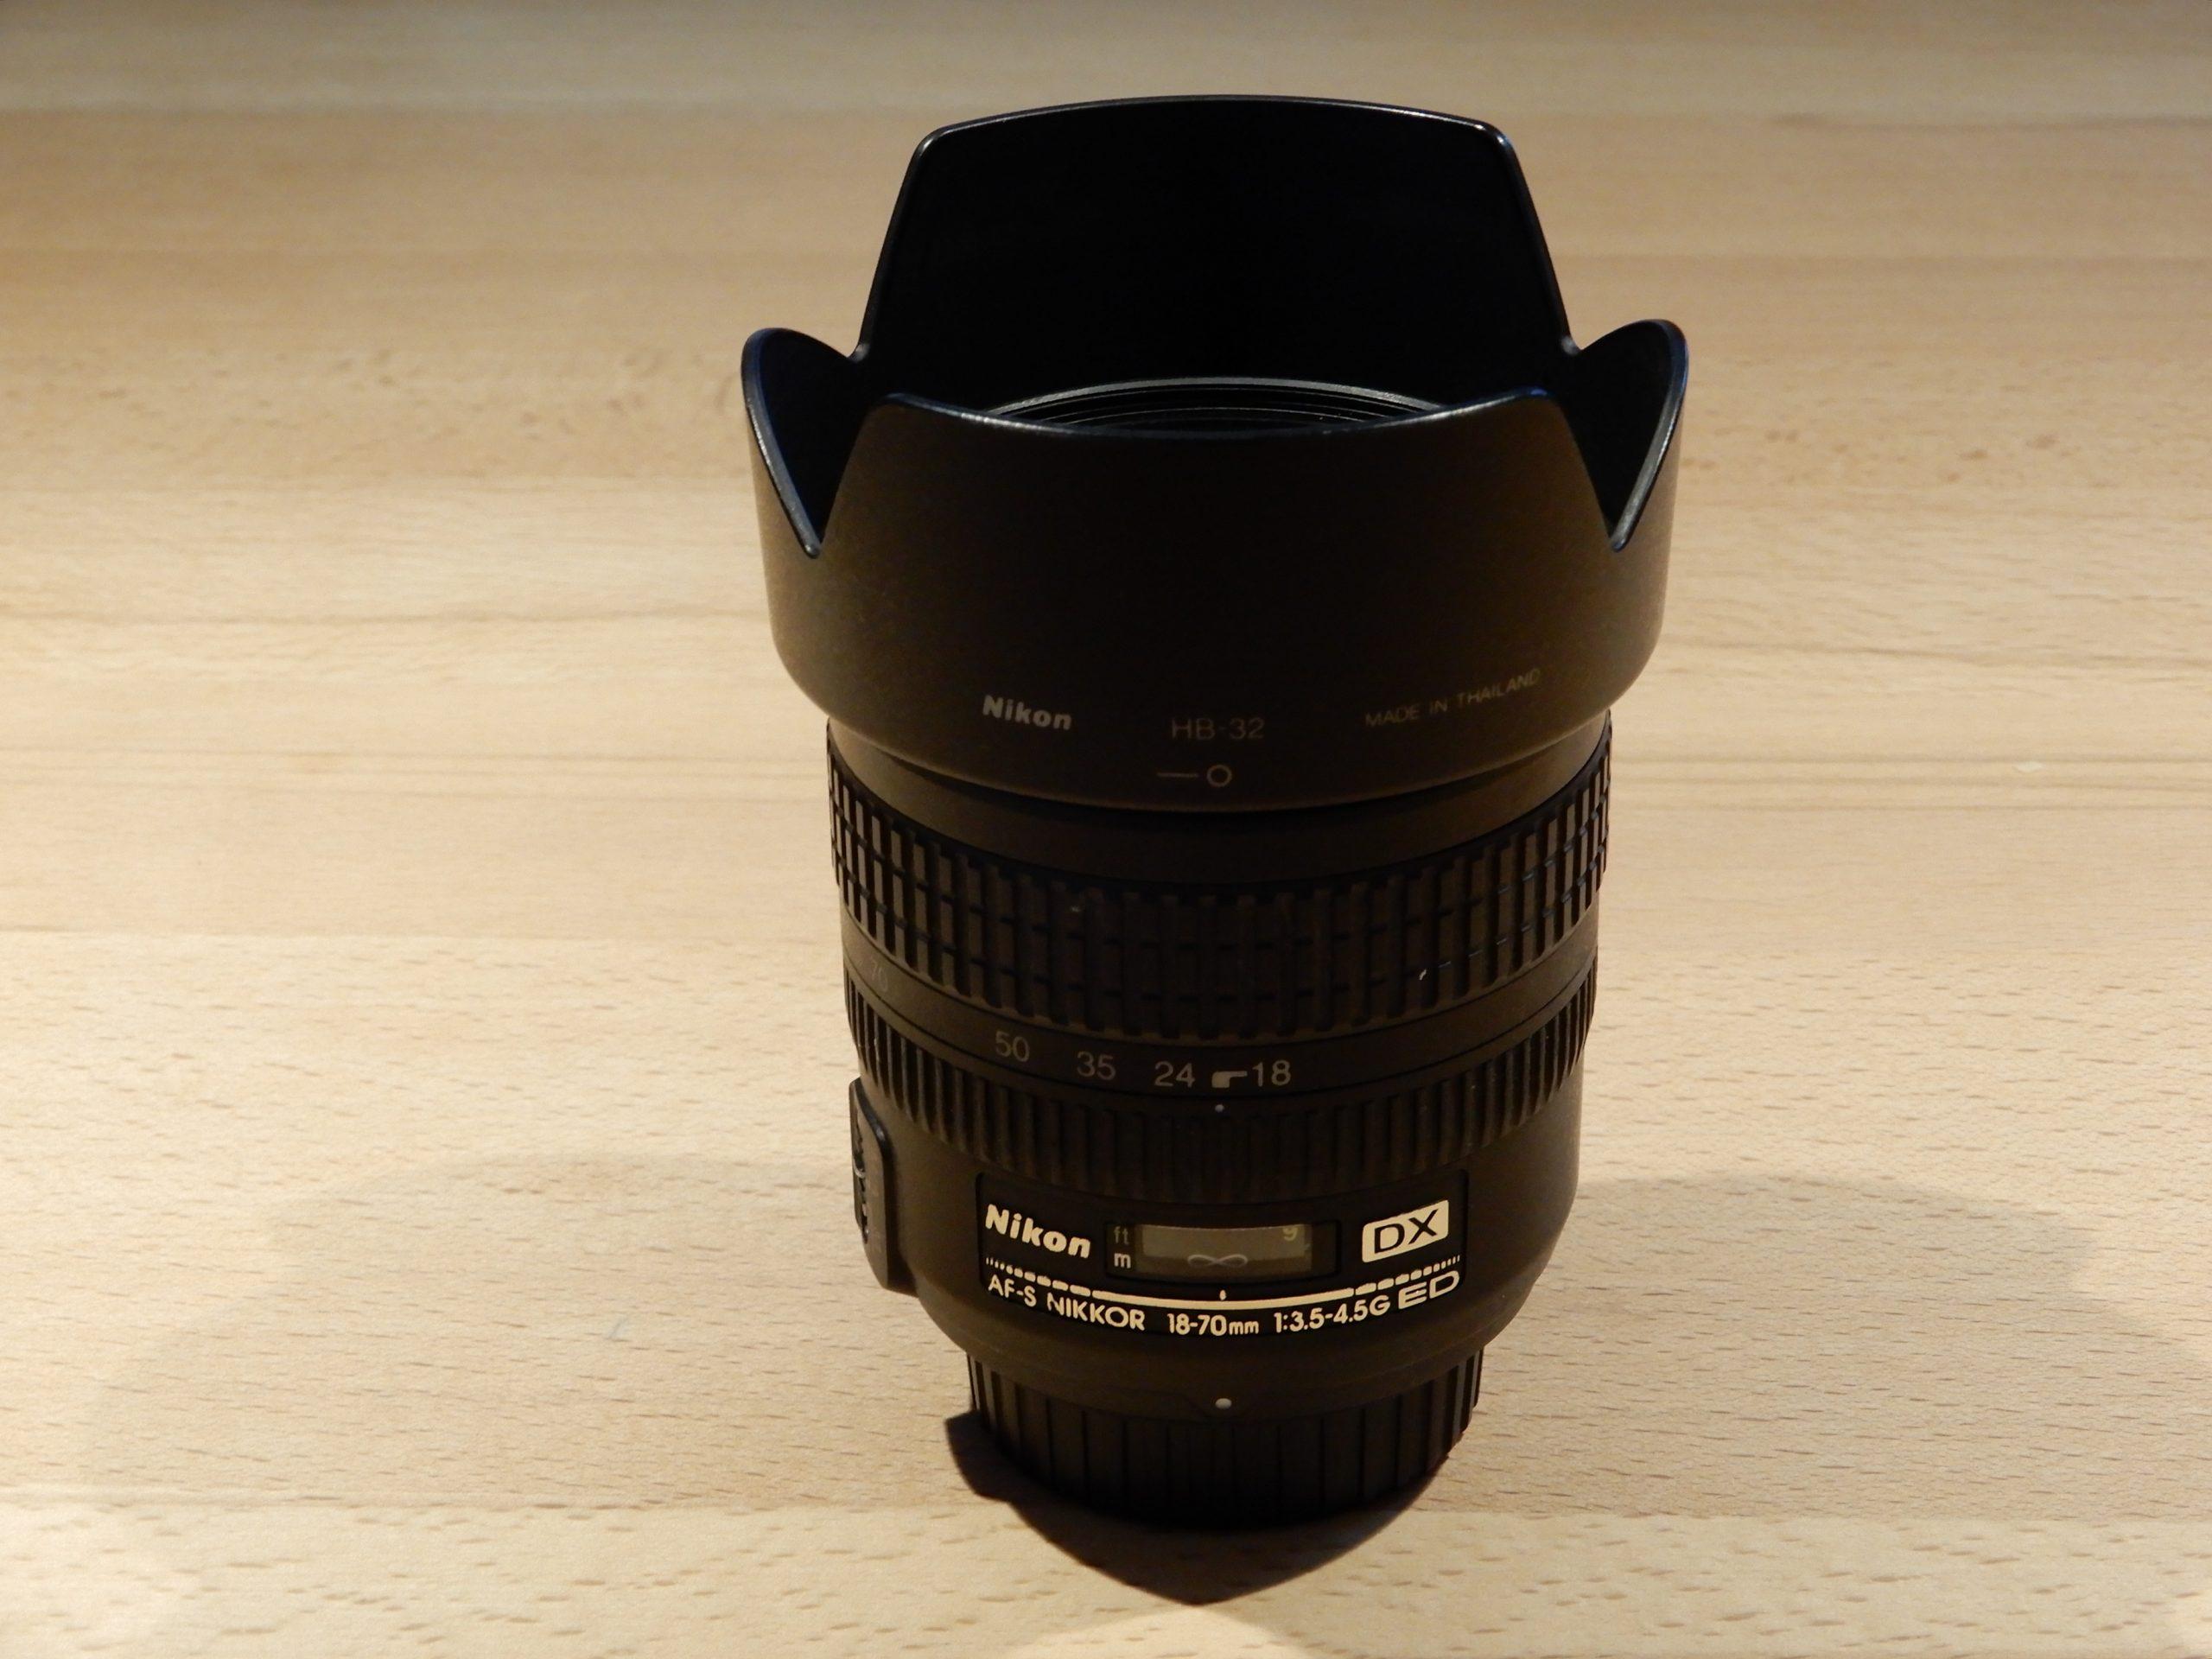 Nikon DX 18-70mm